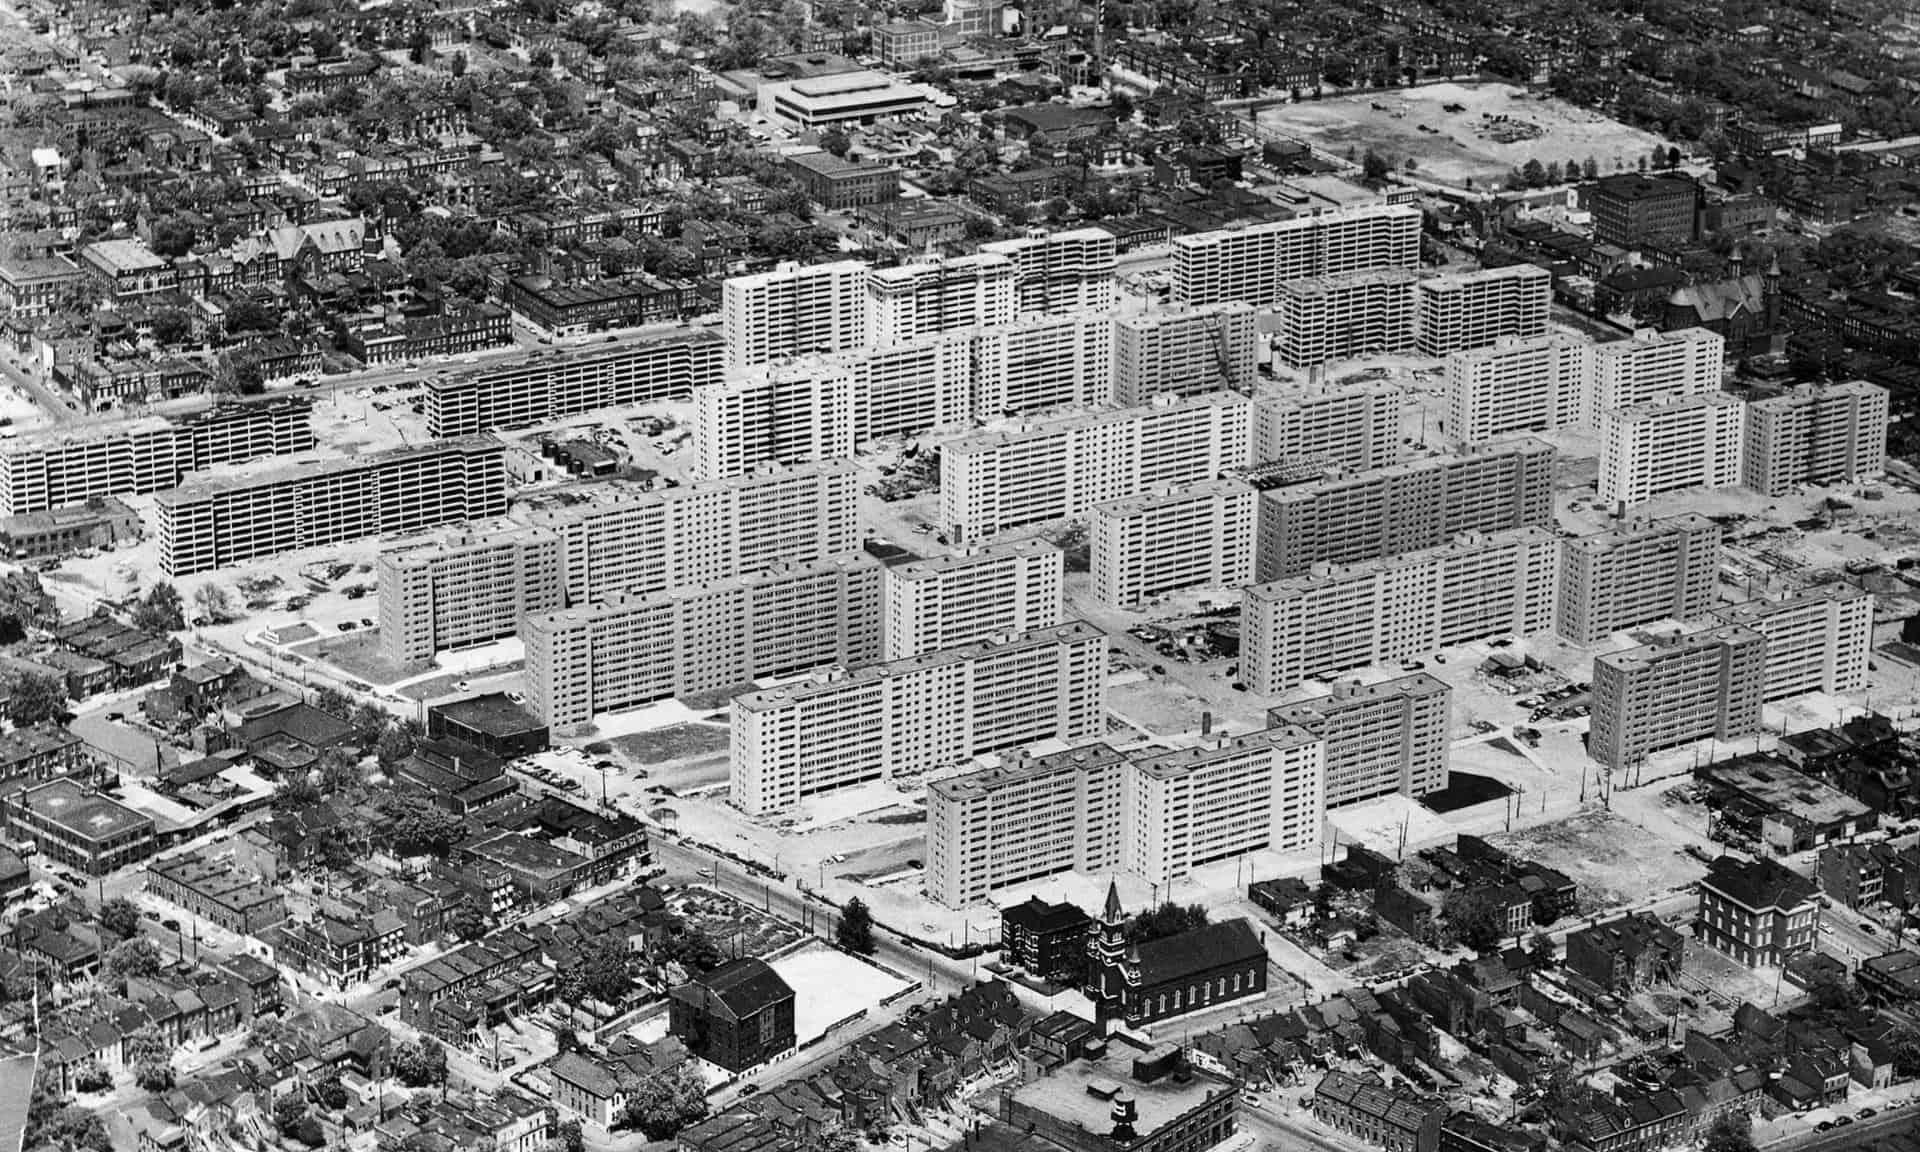 The Strange Case of the Pruitt-Igoe Housing Complex – architecture moods